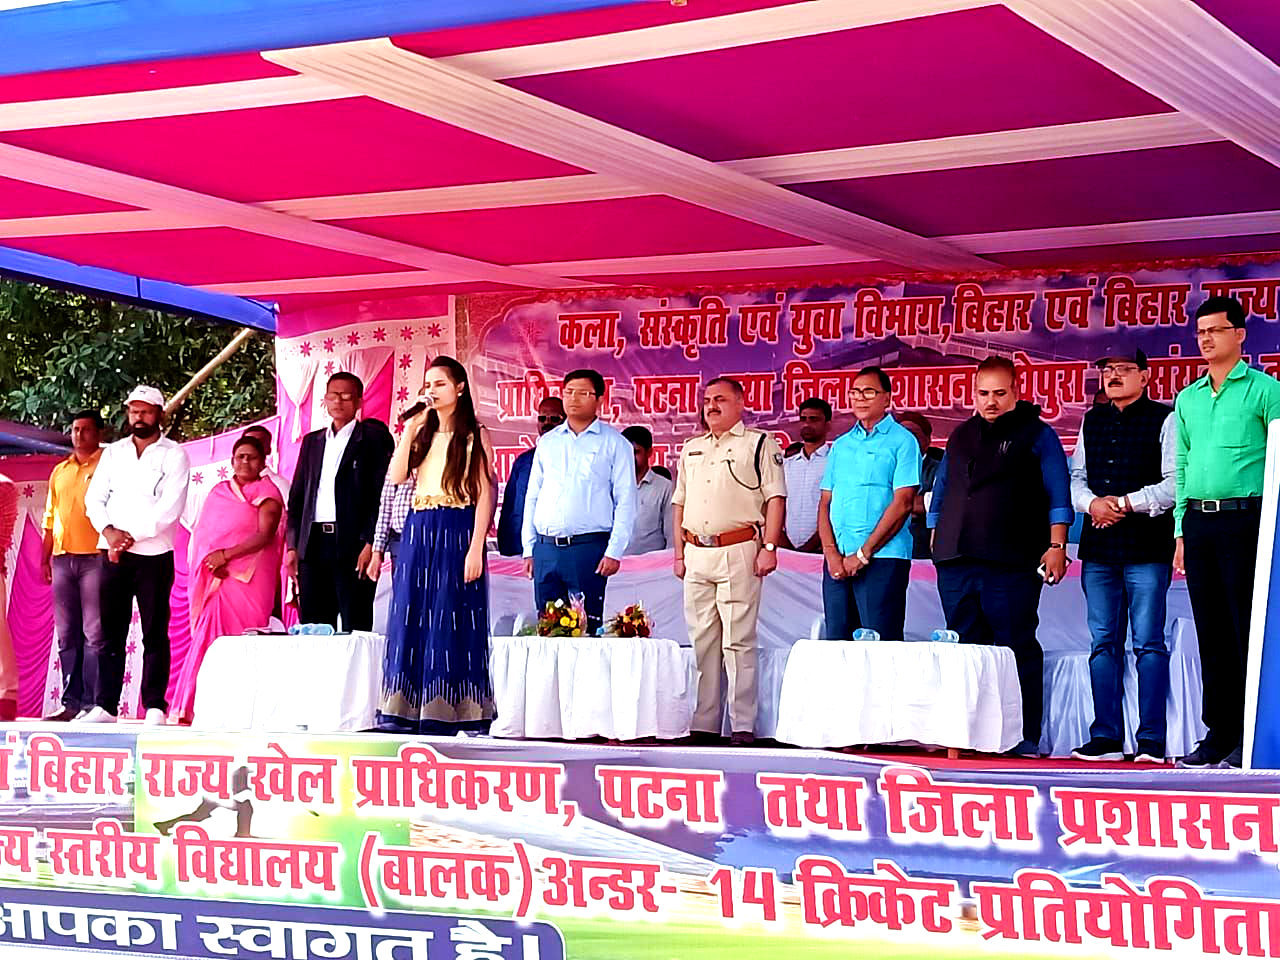 DM, SP, NDC, Dr.Madhepuri, LDM Ranjan Kumar Jha, Santosh Jha, Arun Kumar, Rekha Devi & others attending National Anthem with a baby singer Shivali.